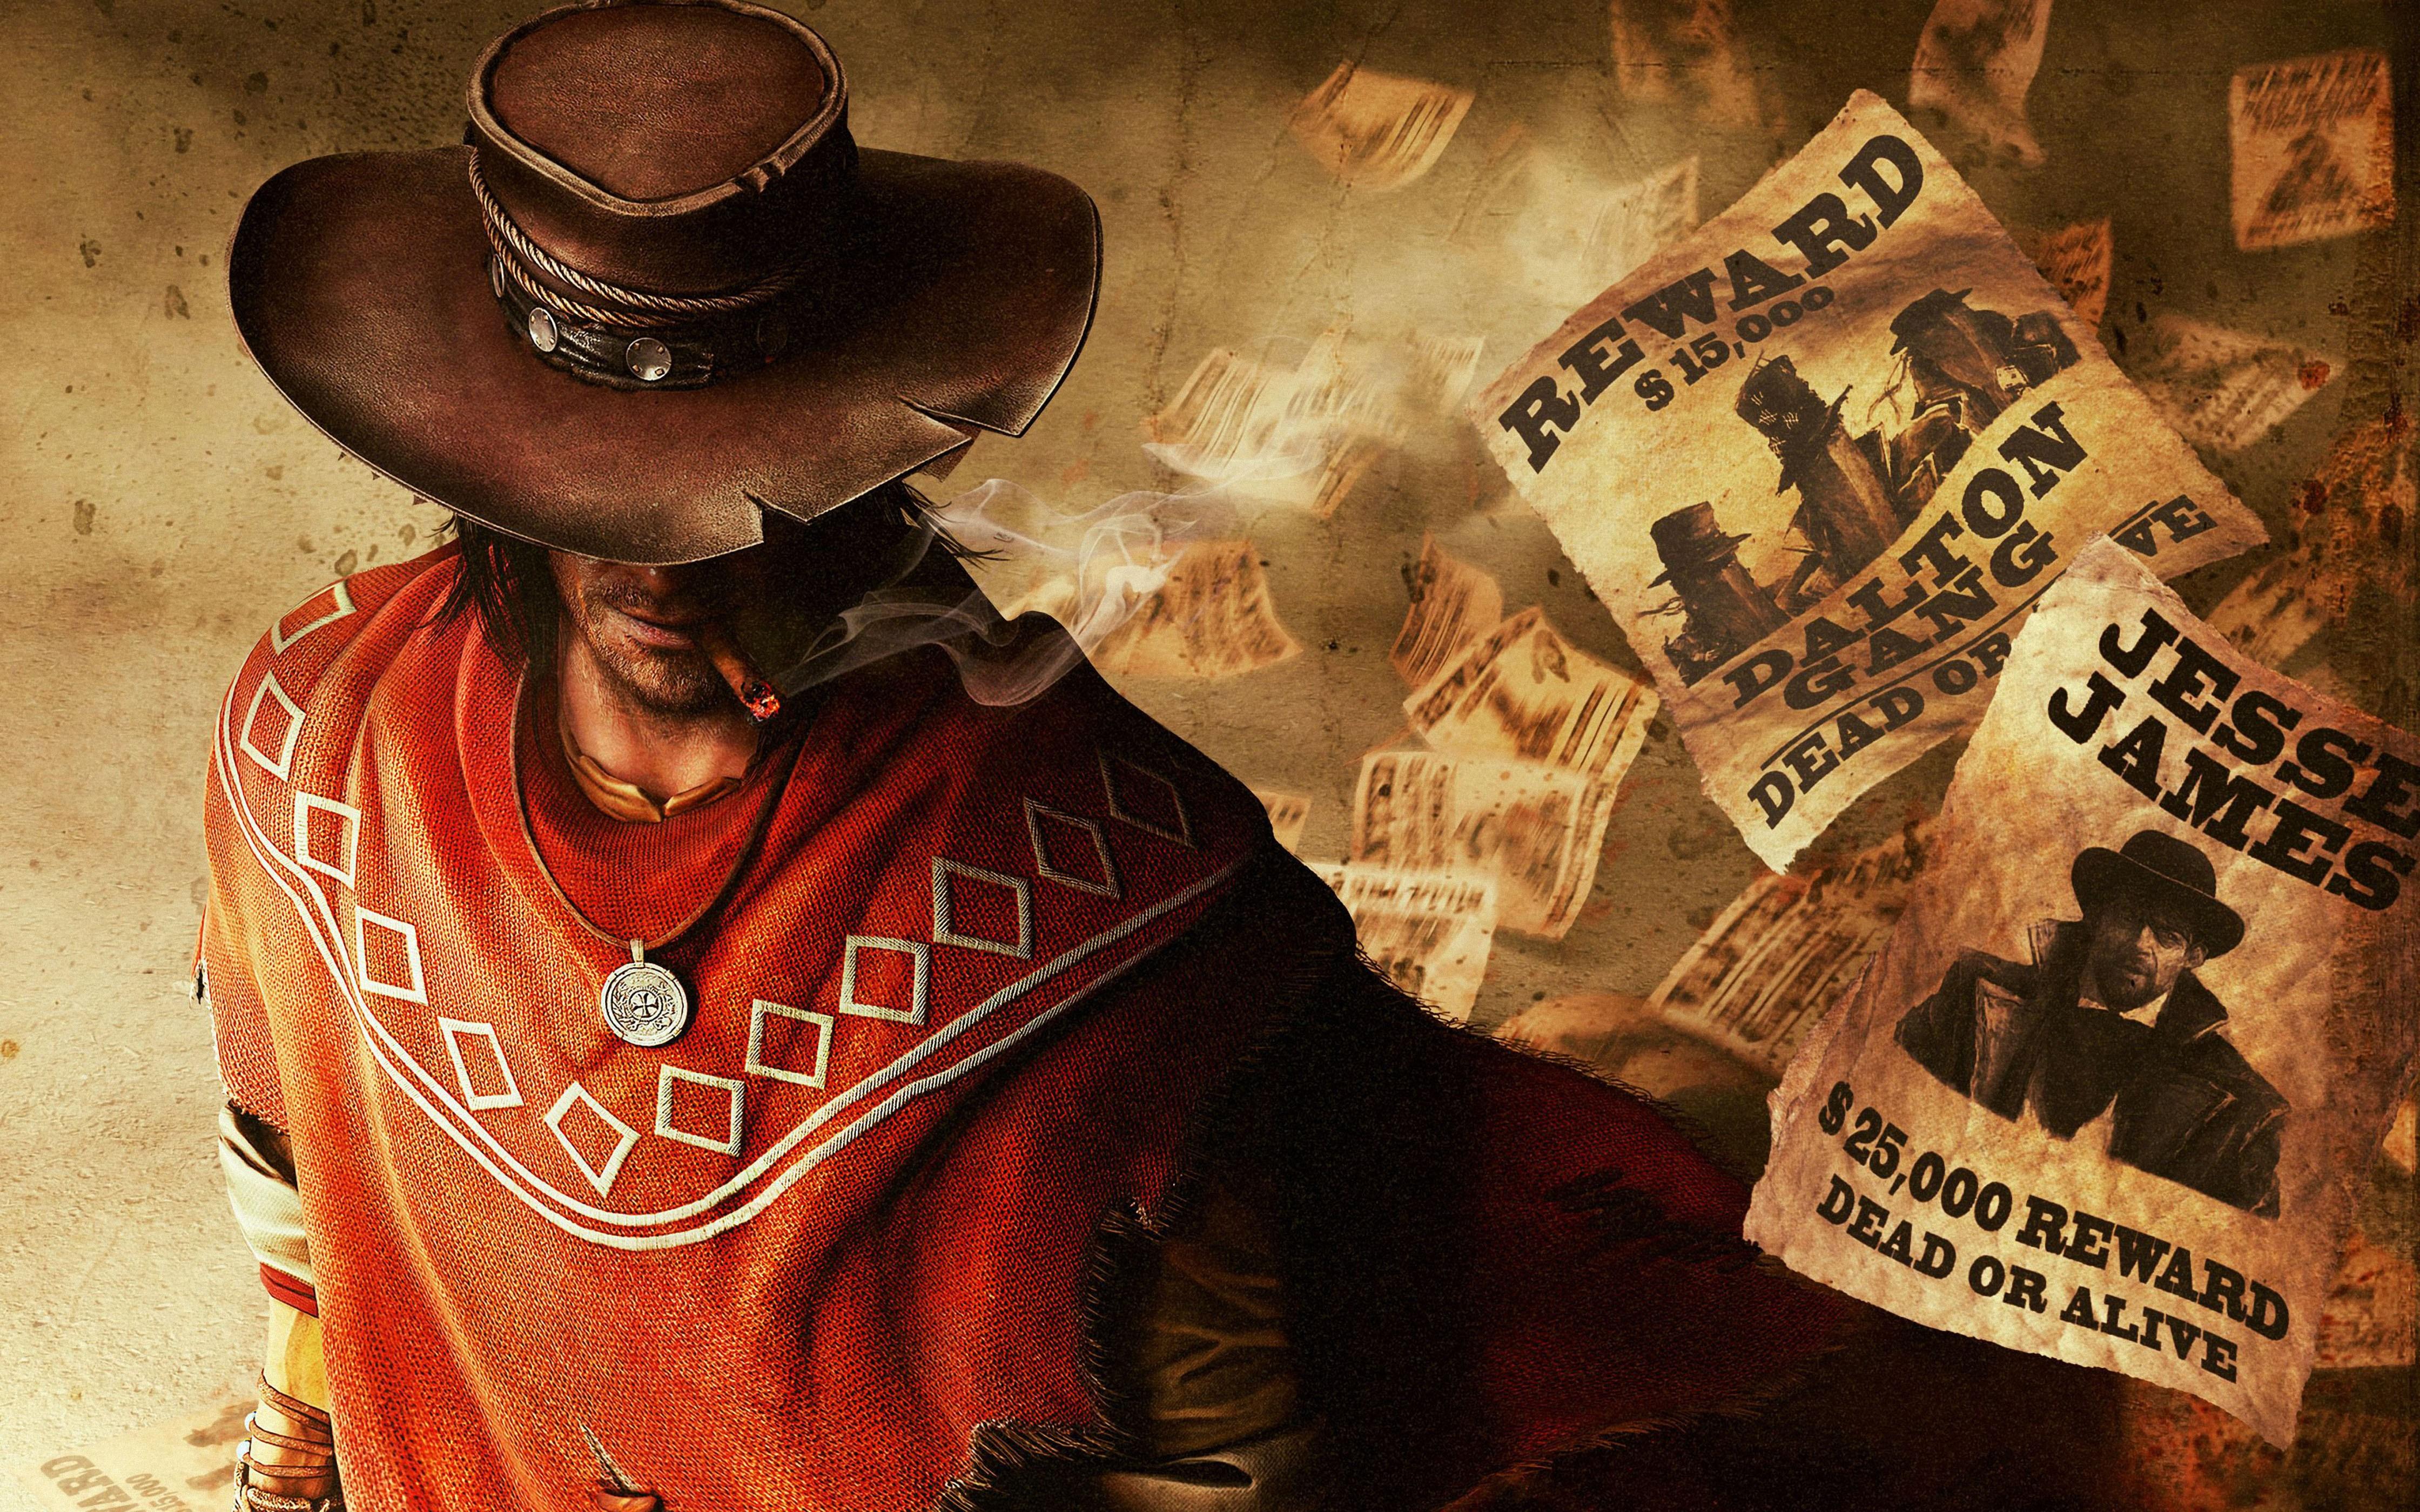 Wallpaper Red Dead Redemption Game Adventure Games